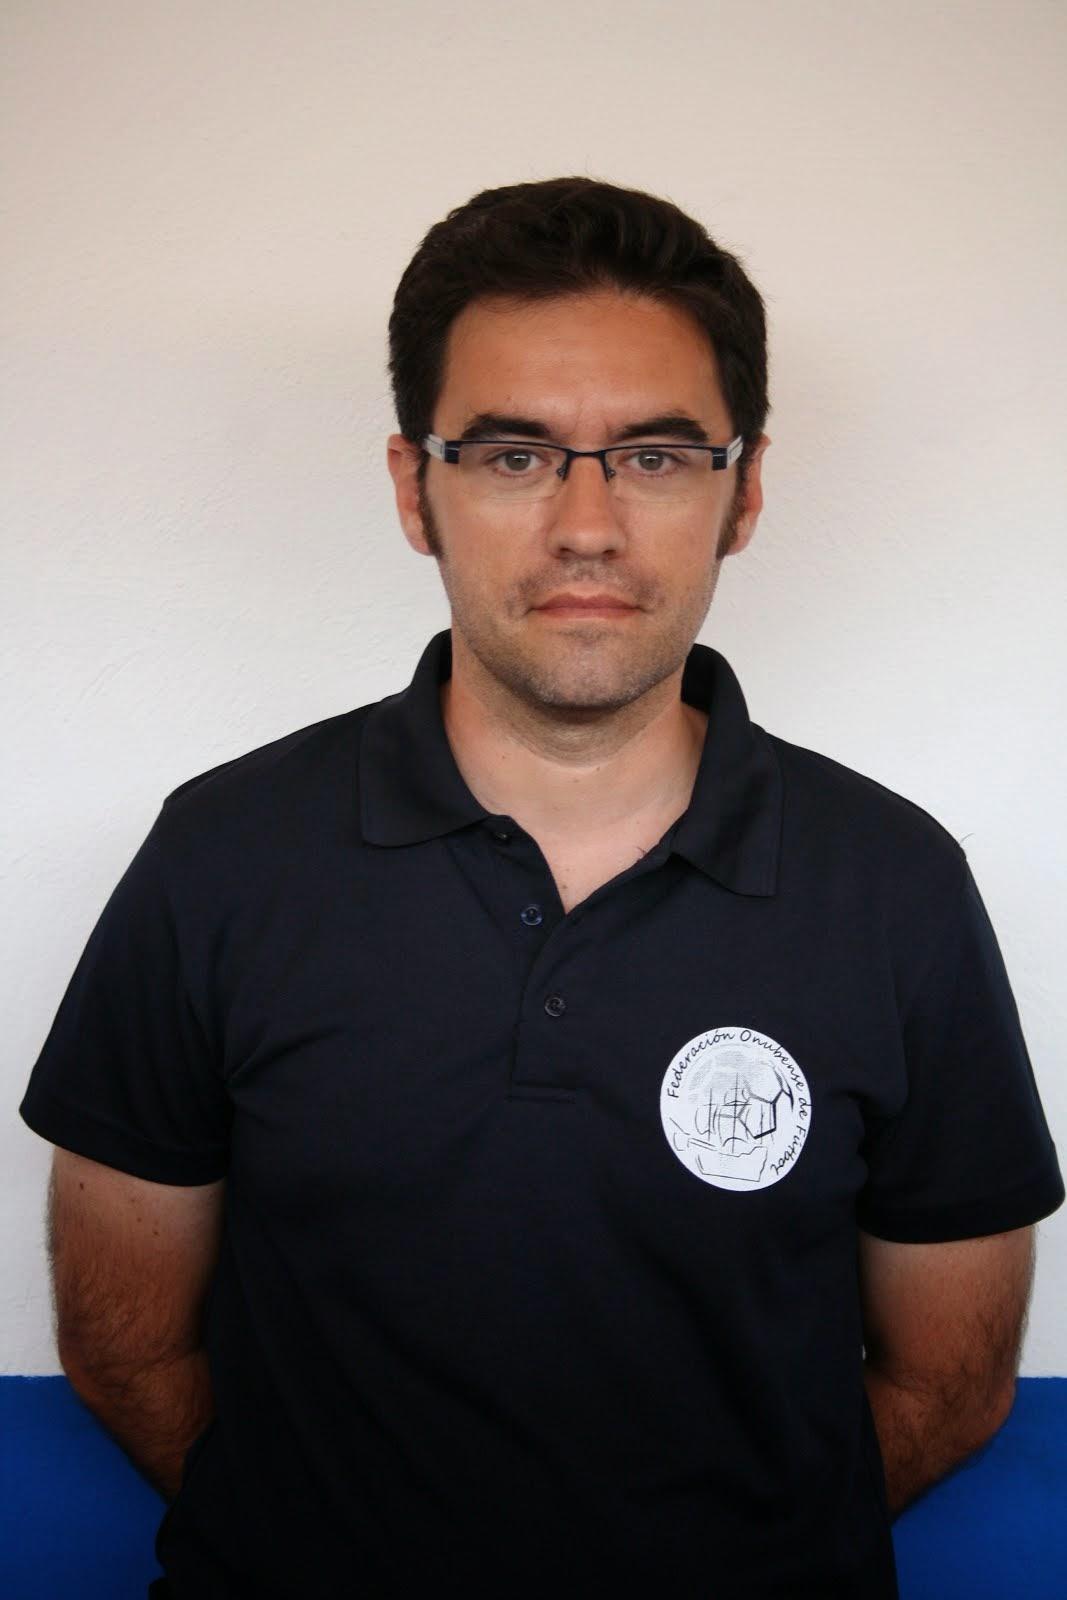 Jero Carrasco